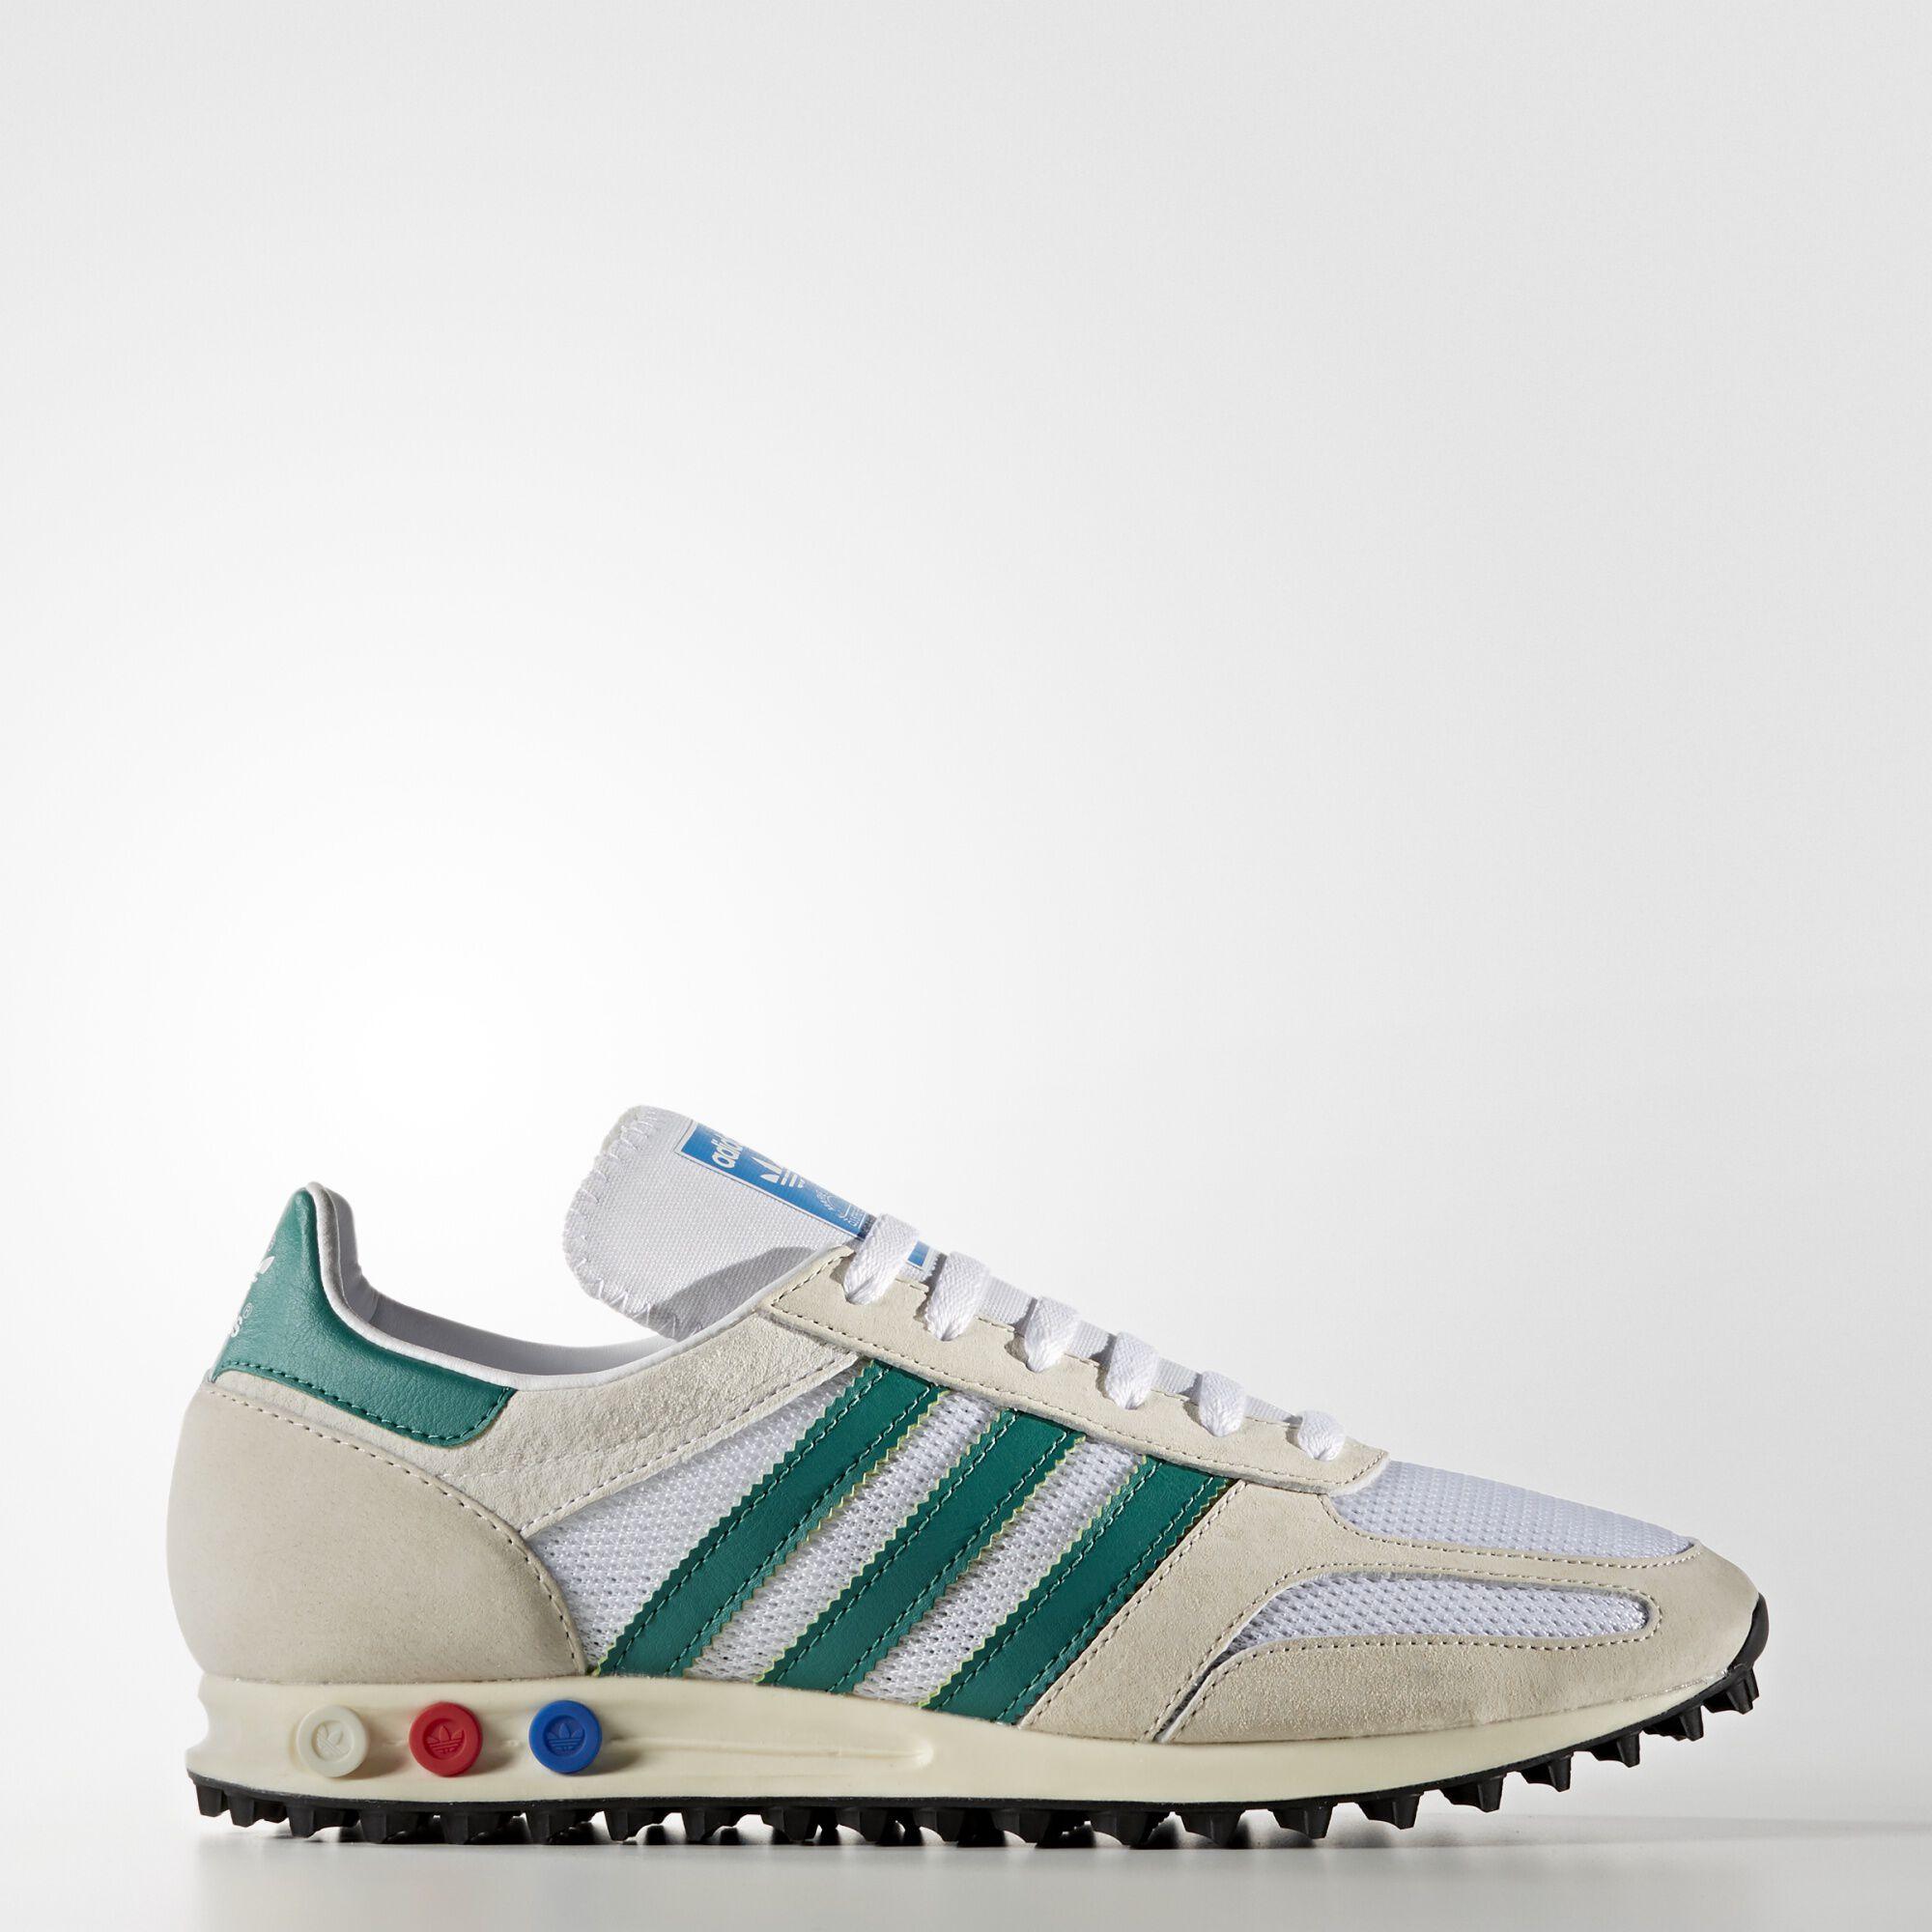 Adidas La Trainer Beige Green